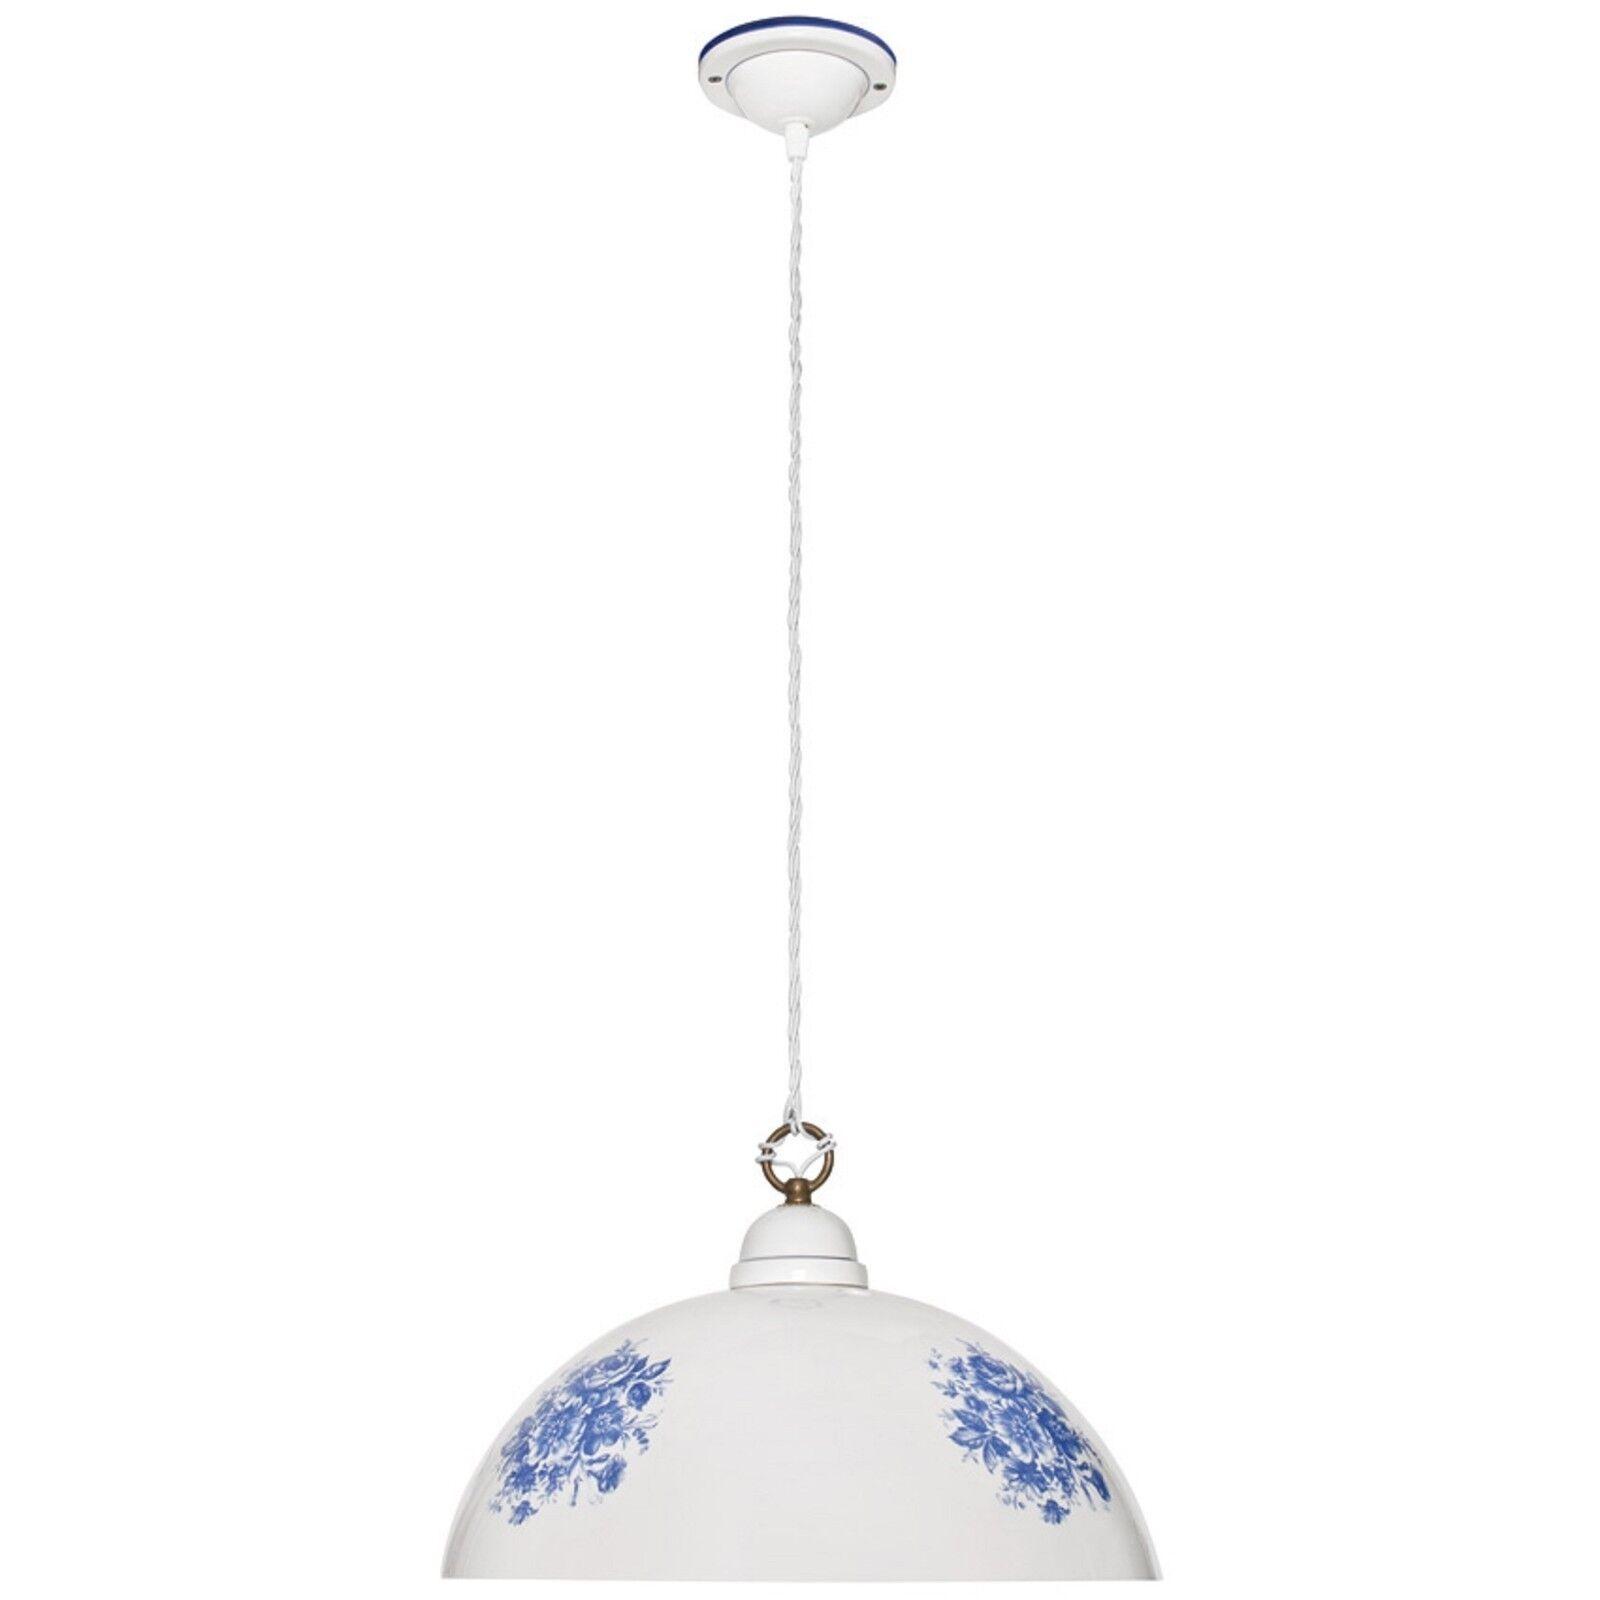 Pendelleuchte Hängeleuchte Keramik weiß blau 1x E27 max. 60W  CERAMICHE BORSO